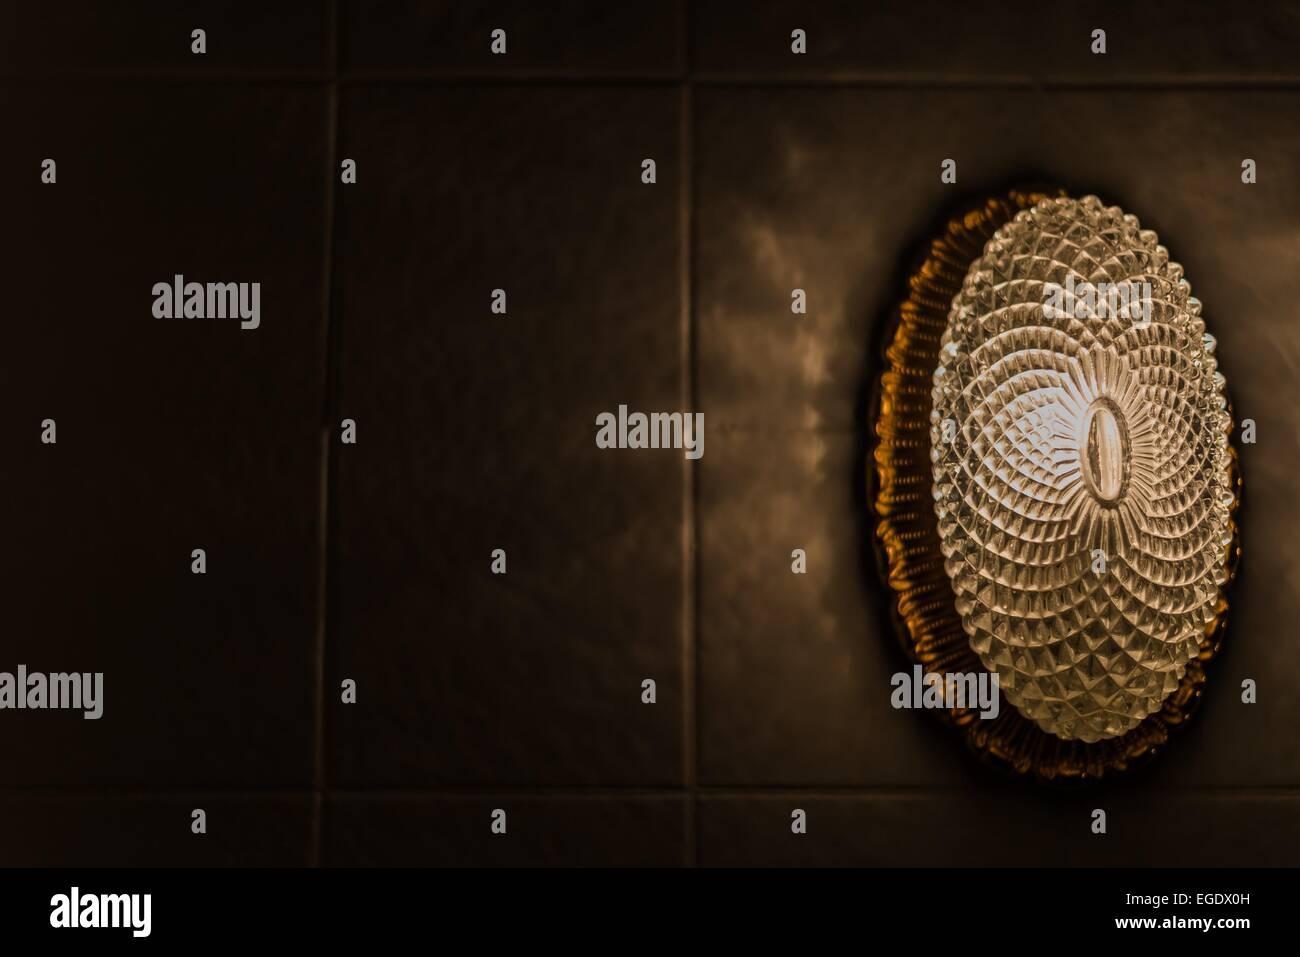 Eine Alte Bad Lampe Stockfoto Bild 78981745 Alamy